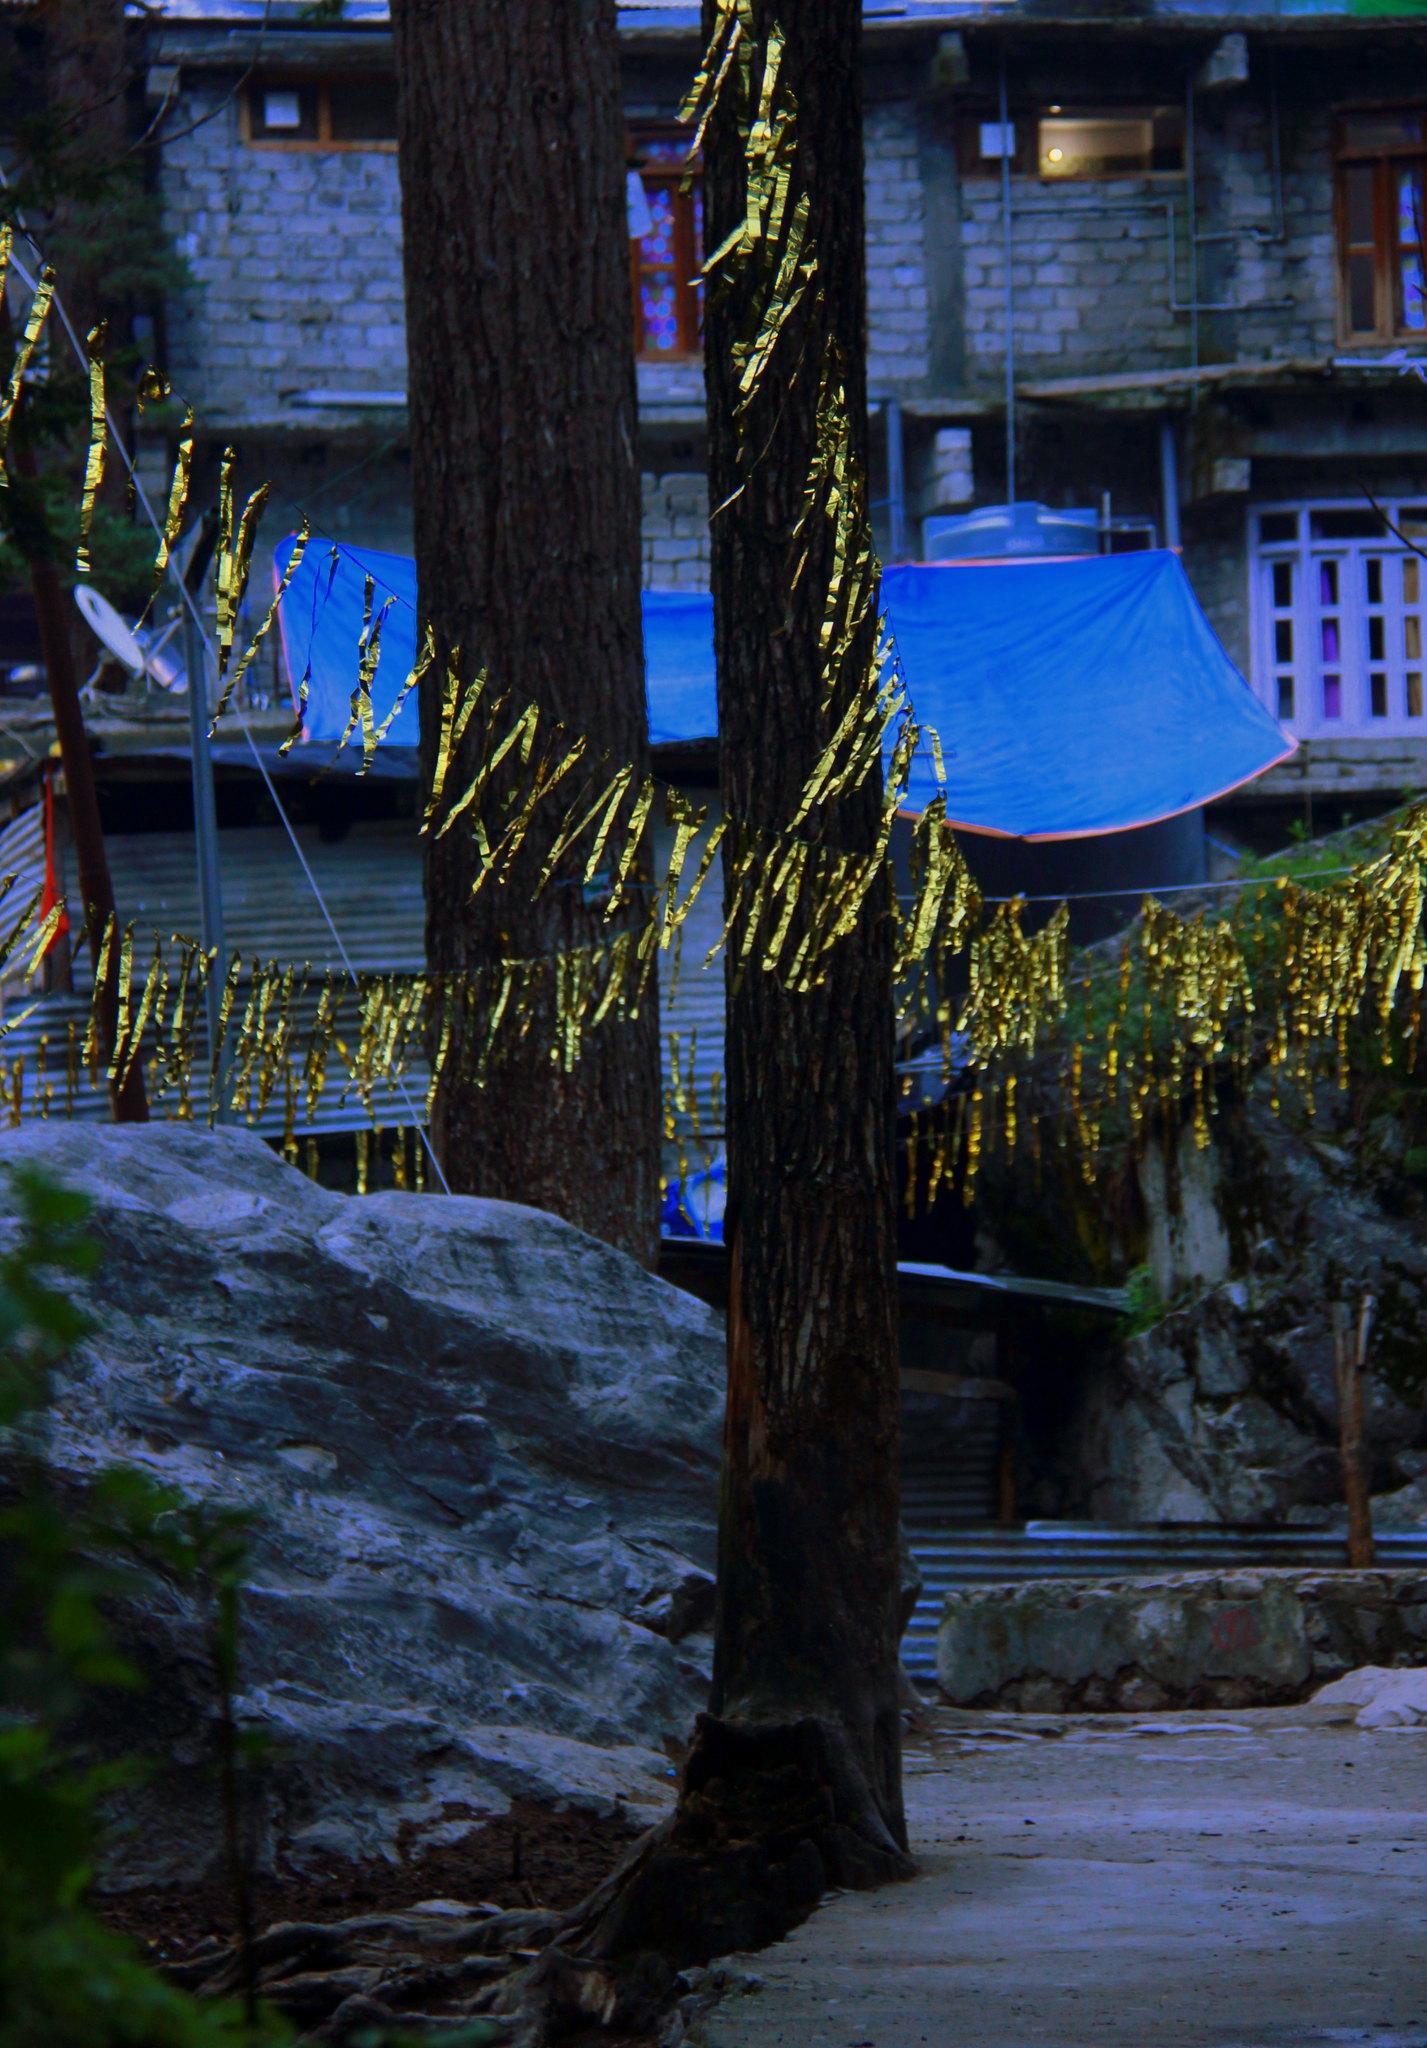 Ghangaria is a tourist village for Hemkund Sahib pilgrims